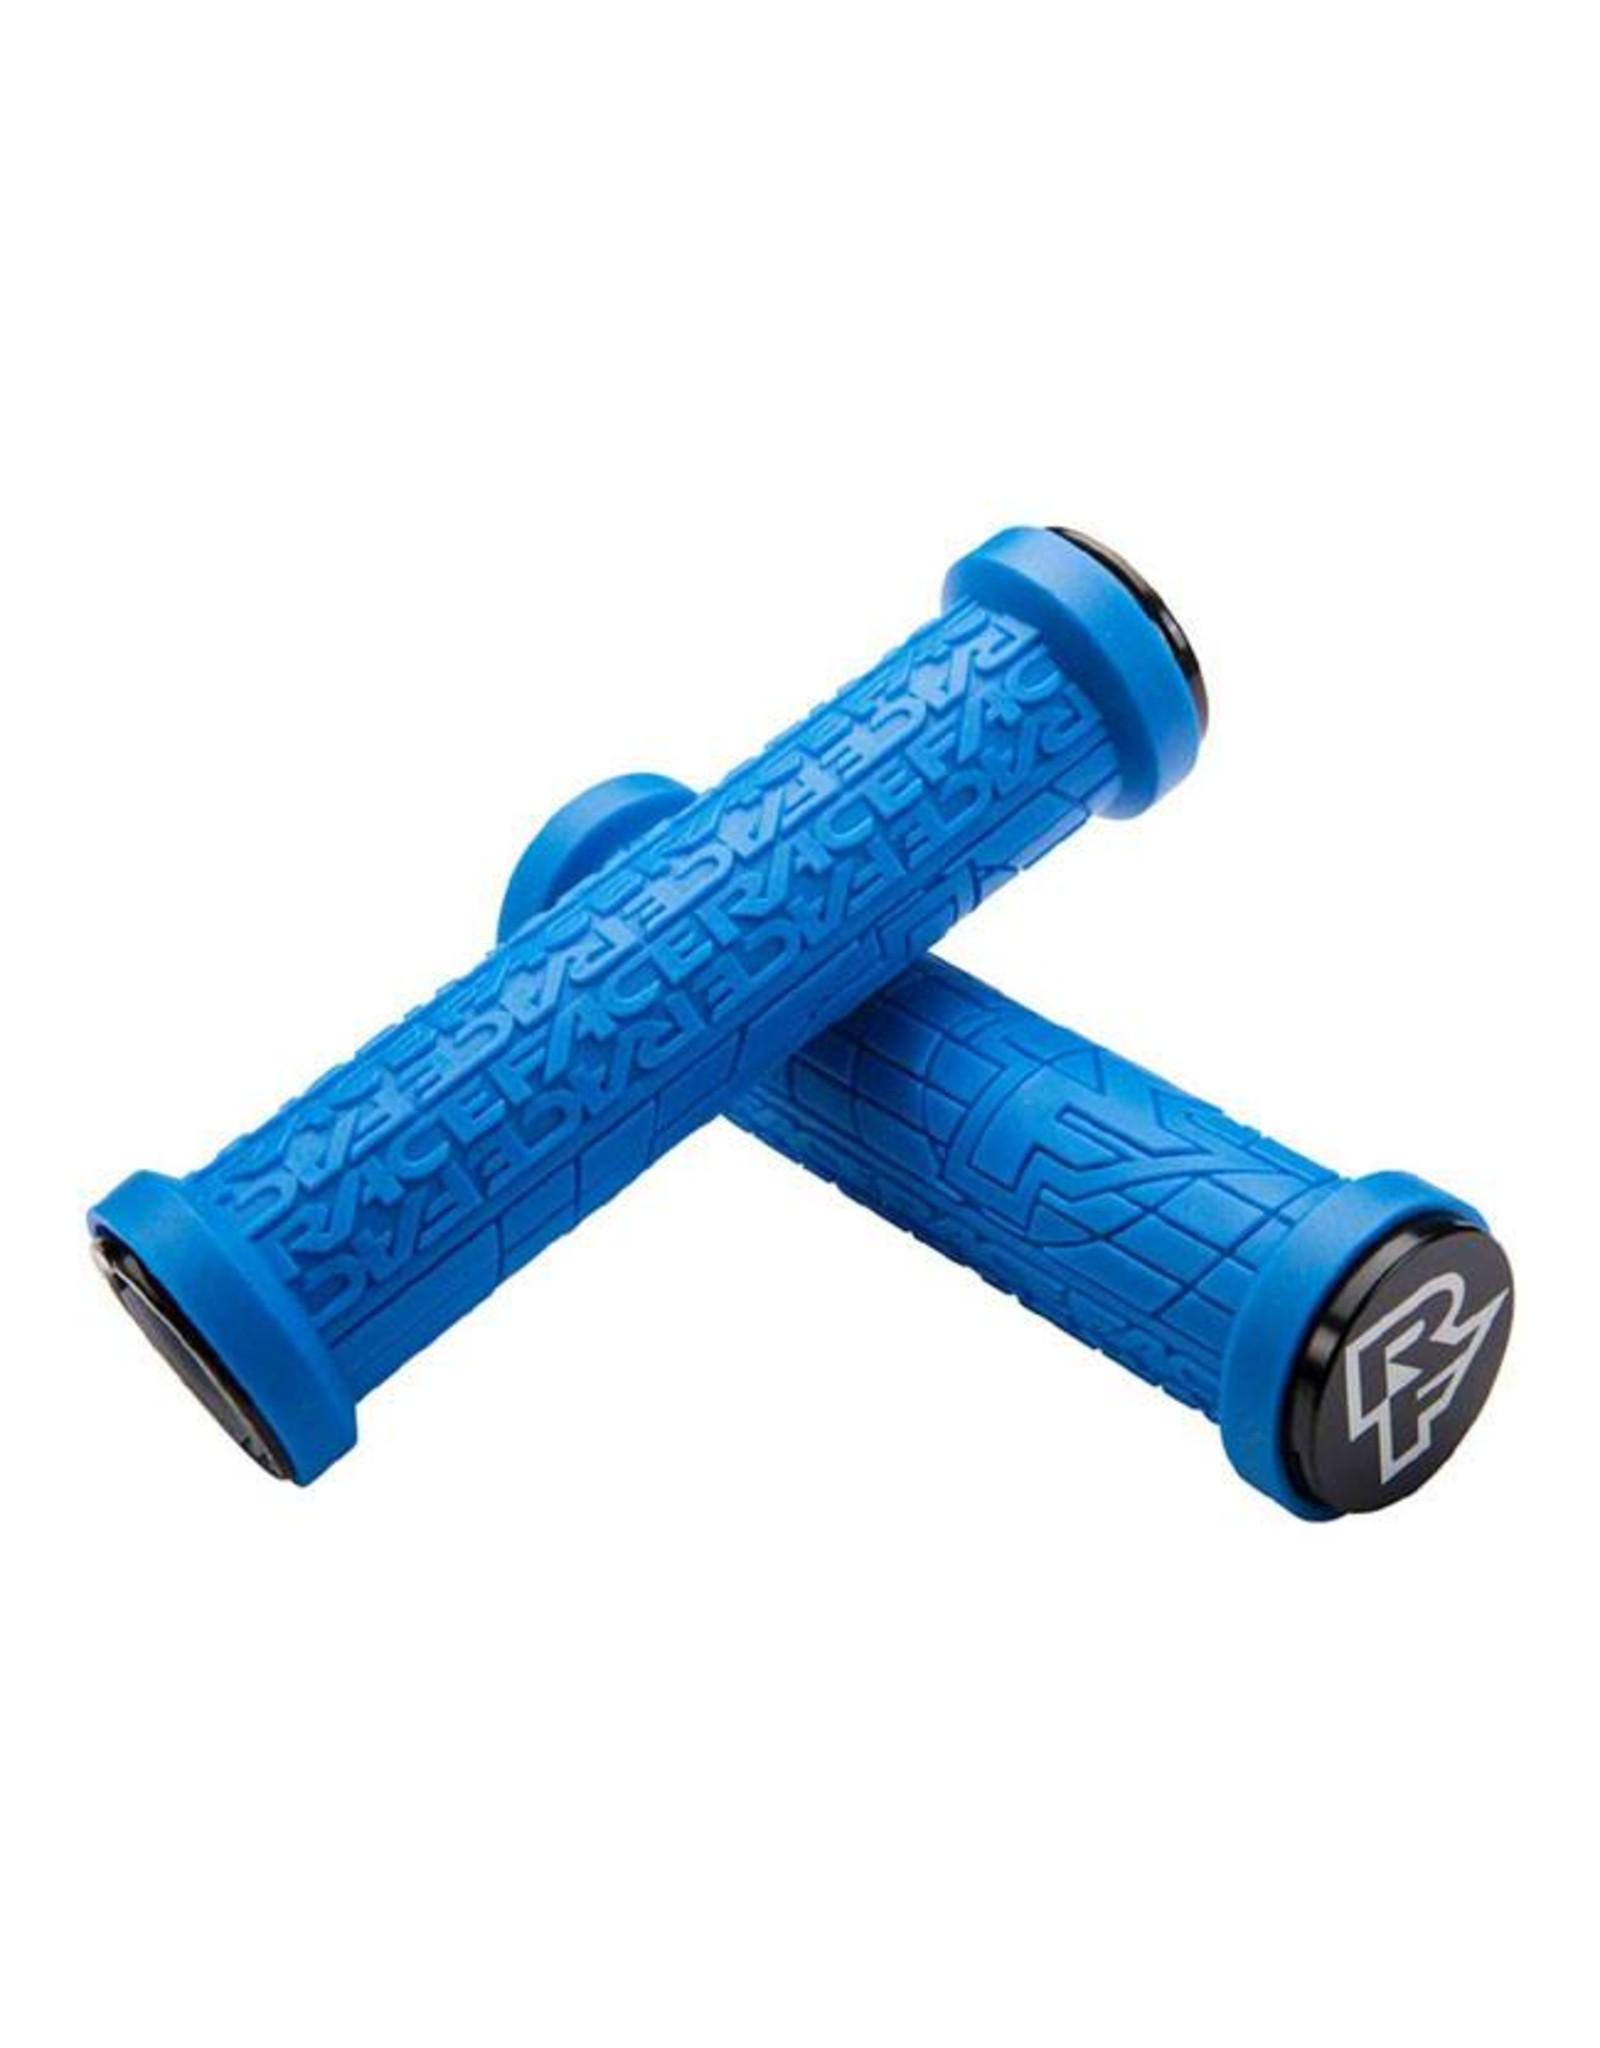 RaceFace RaceFace Grippler 30mm Lock-On Grip Blue